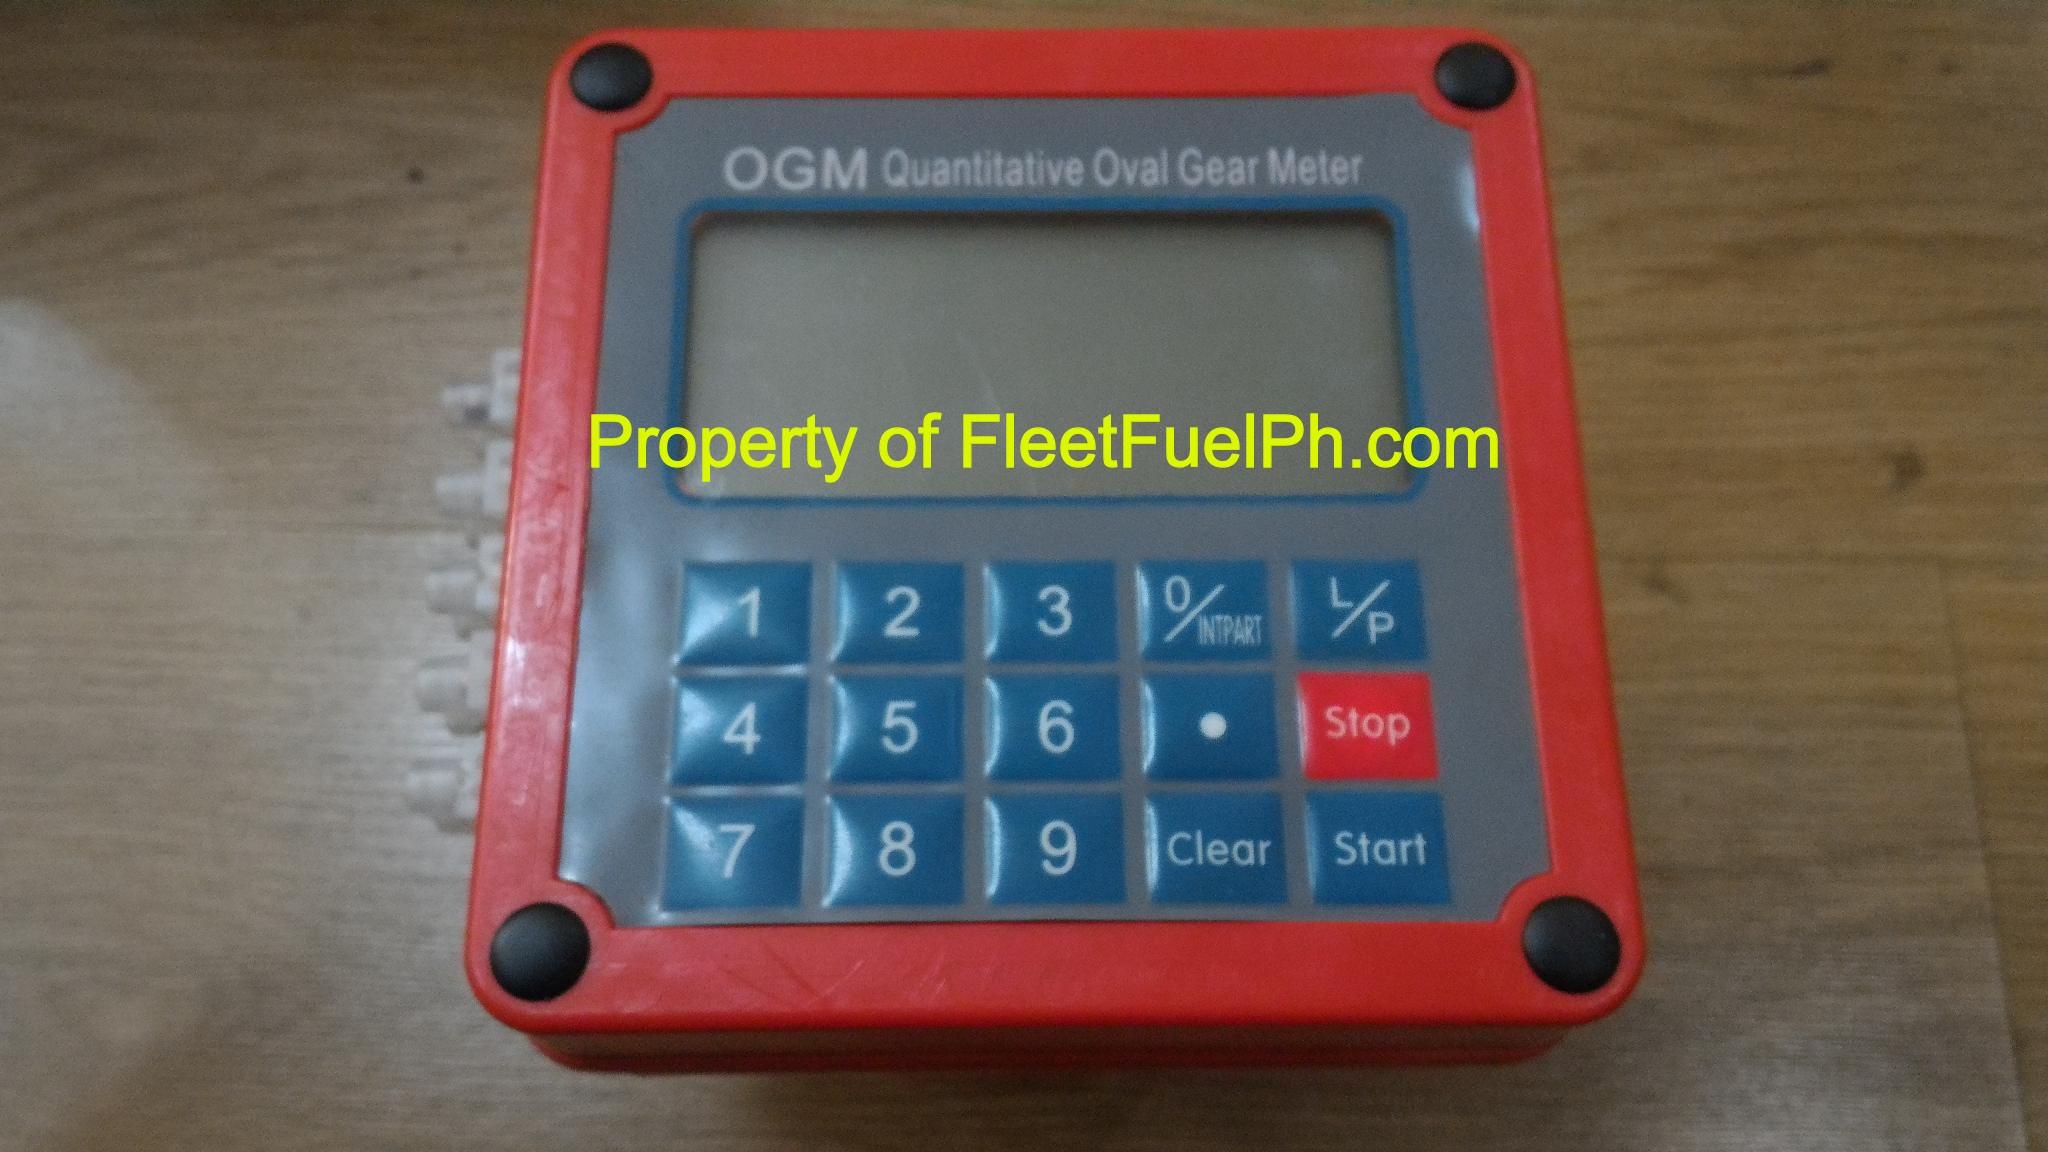 QGM-25N Digital Quantitative Oval Gear Flow Meter